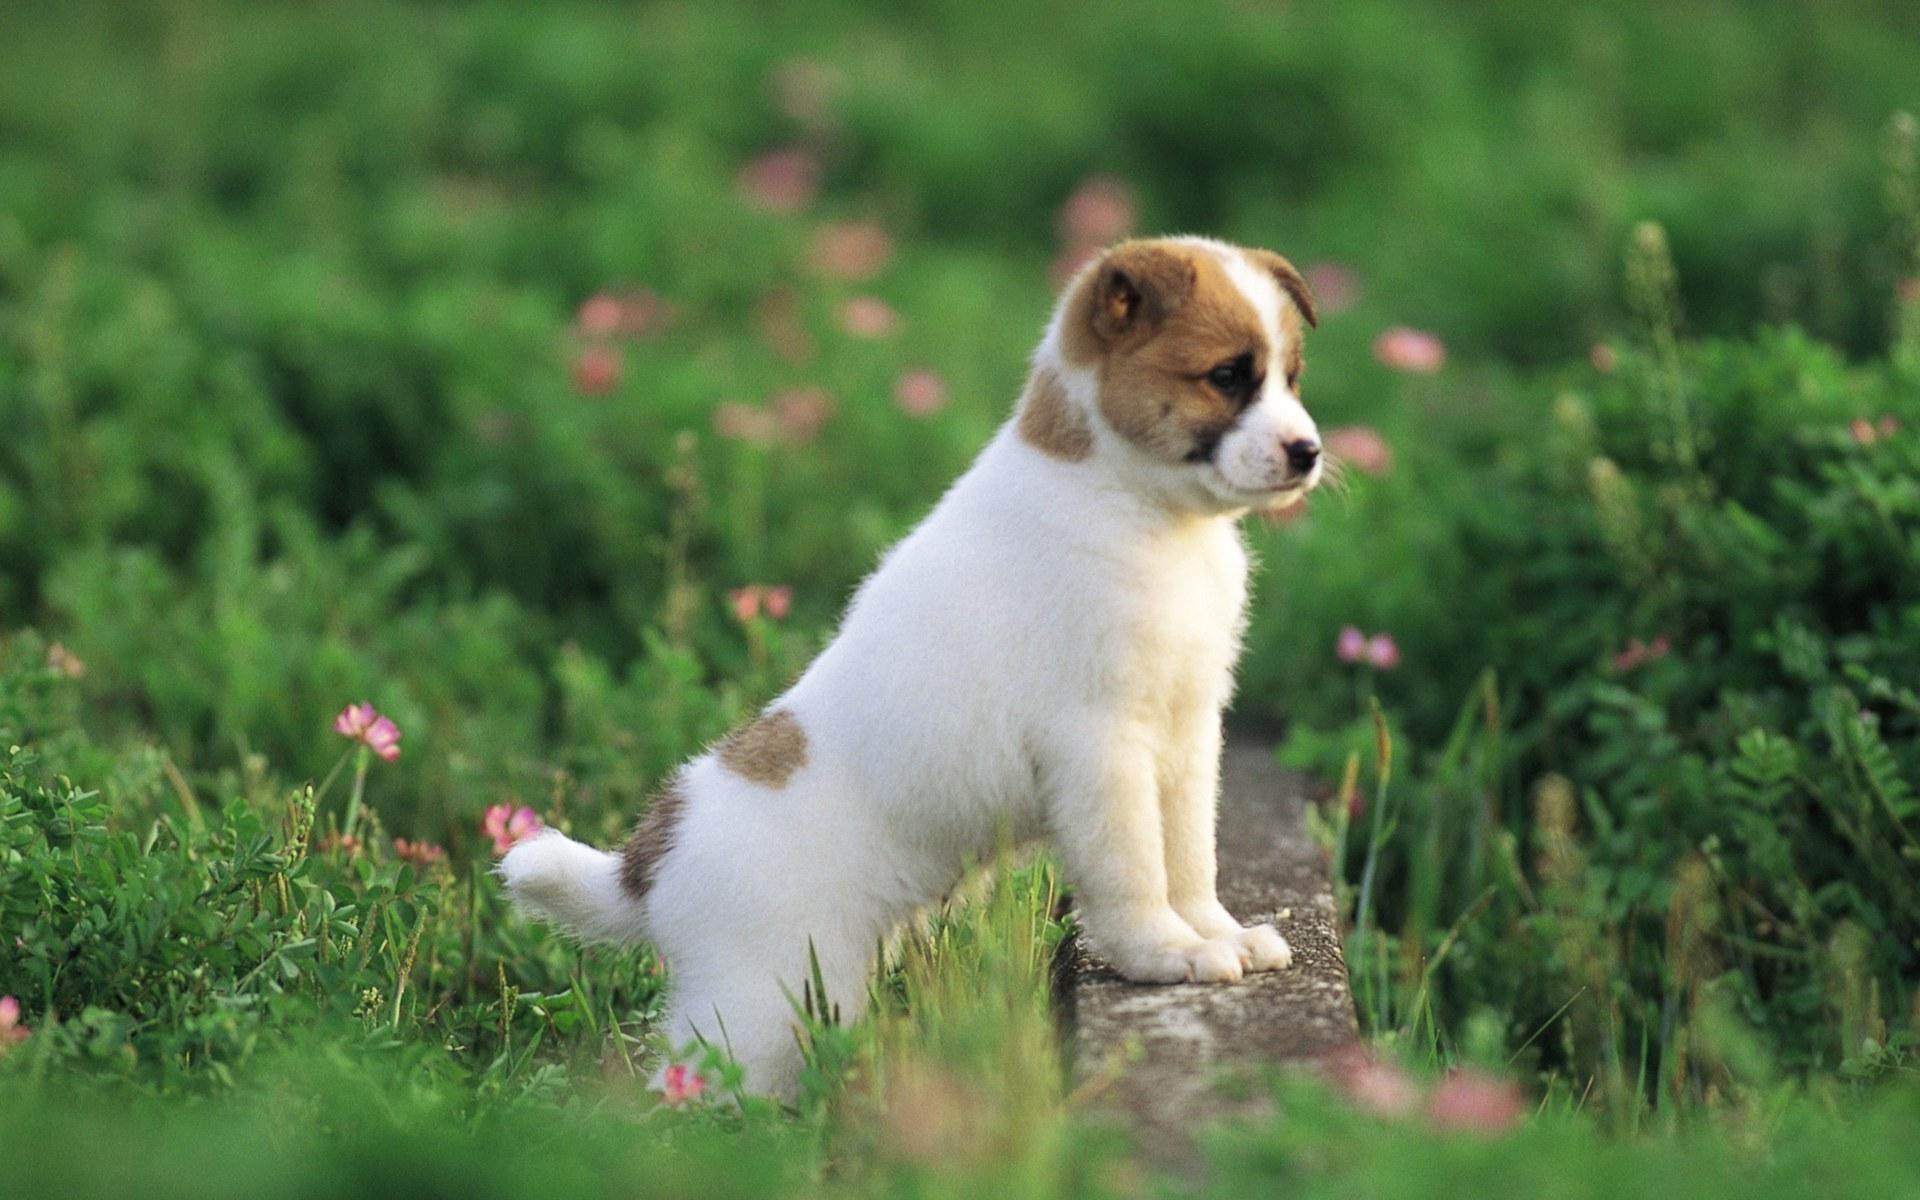 Pretty Dog wallpaper – Puppies Wallpaper (13906519) – Fanpop